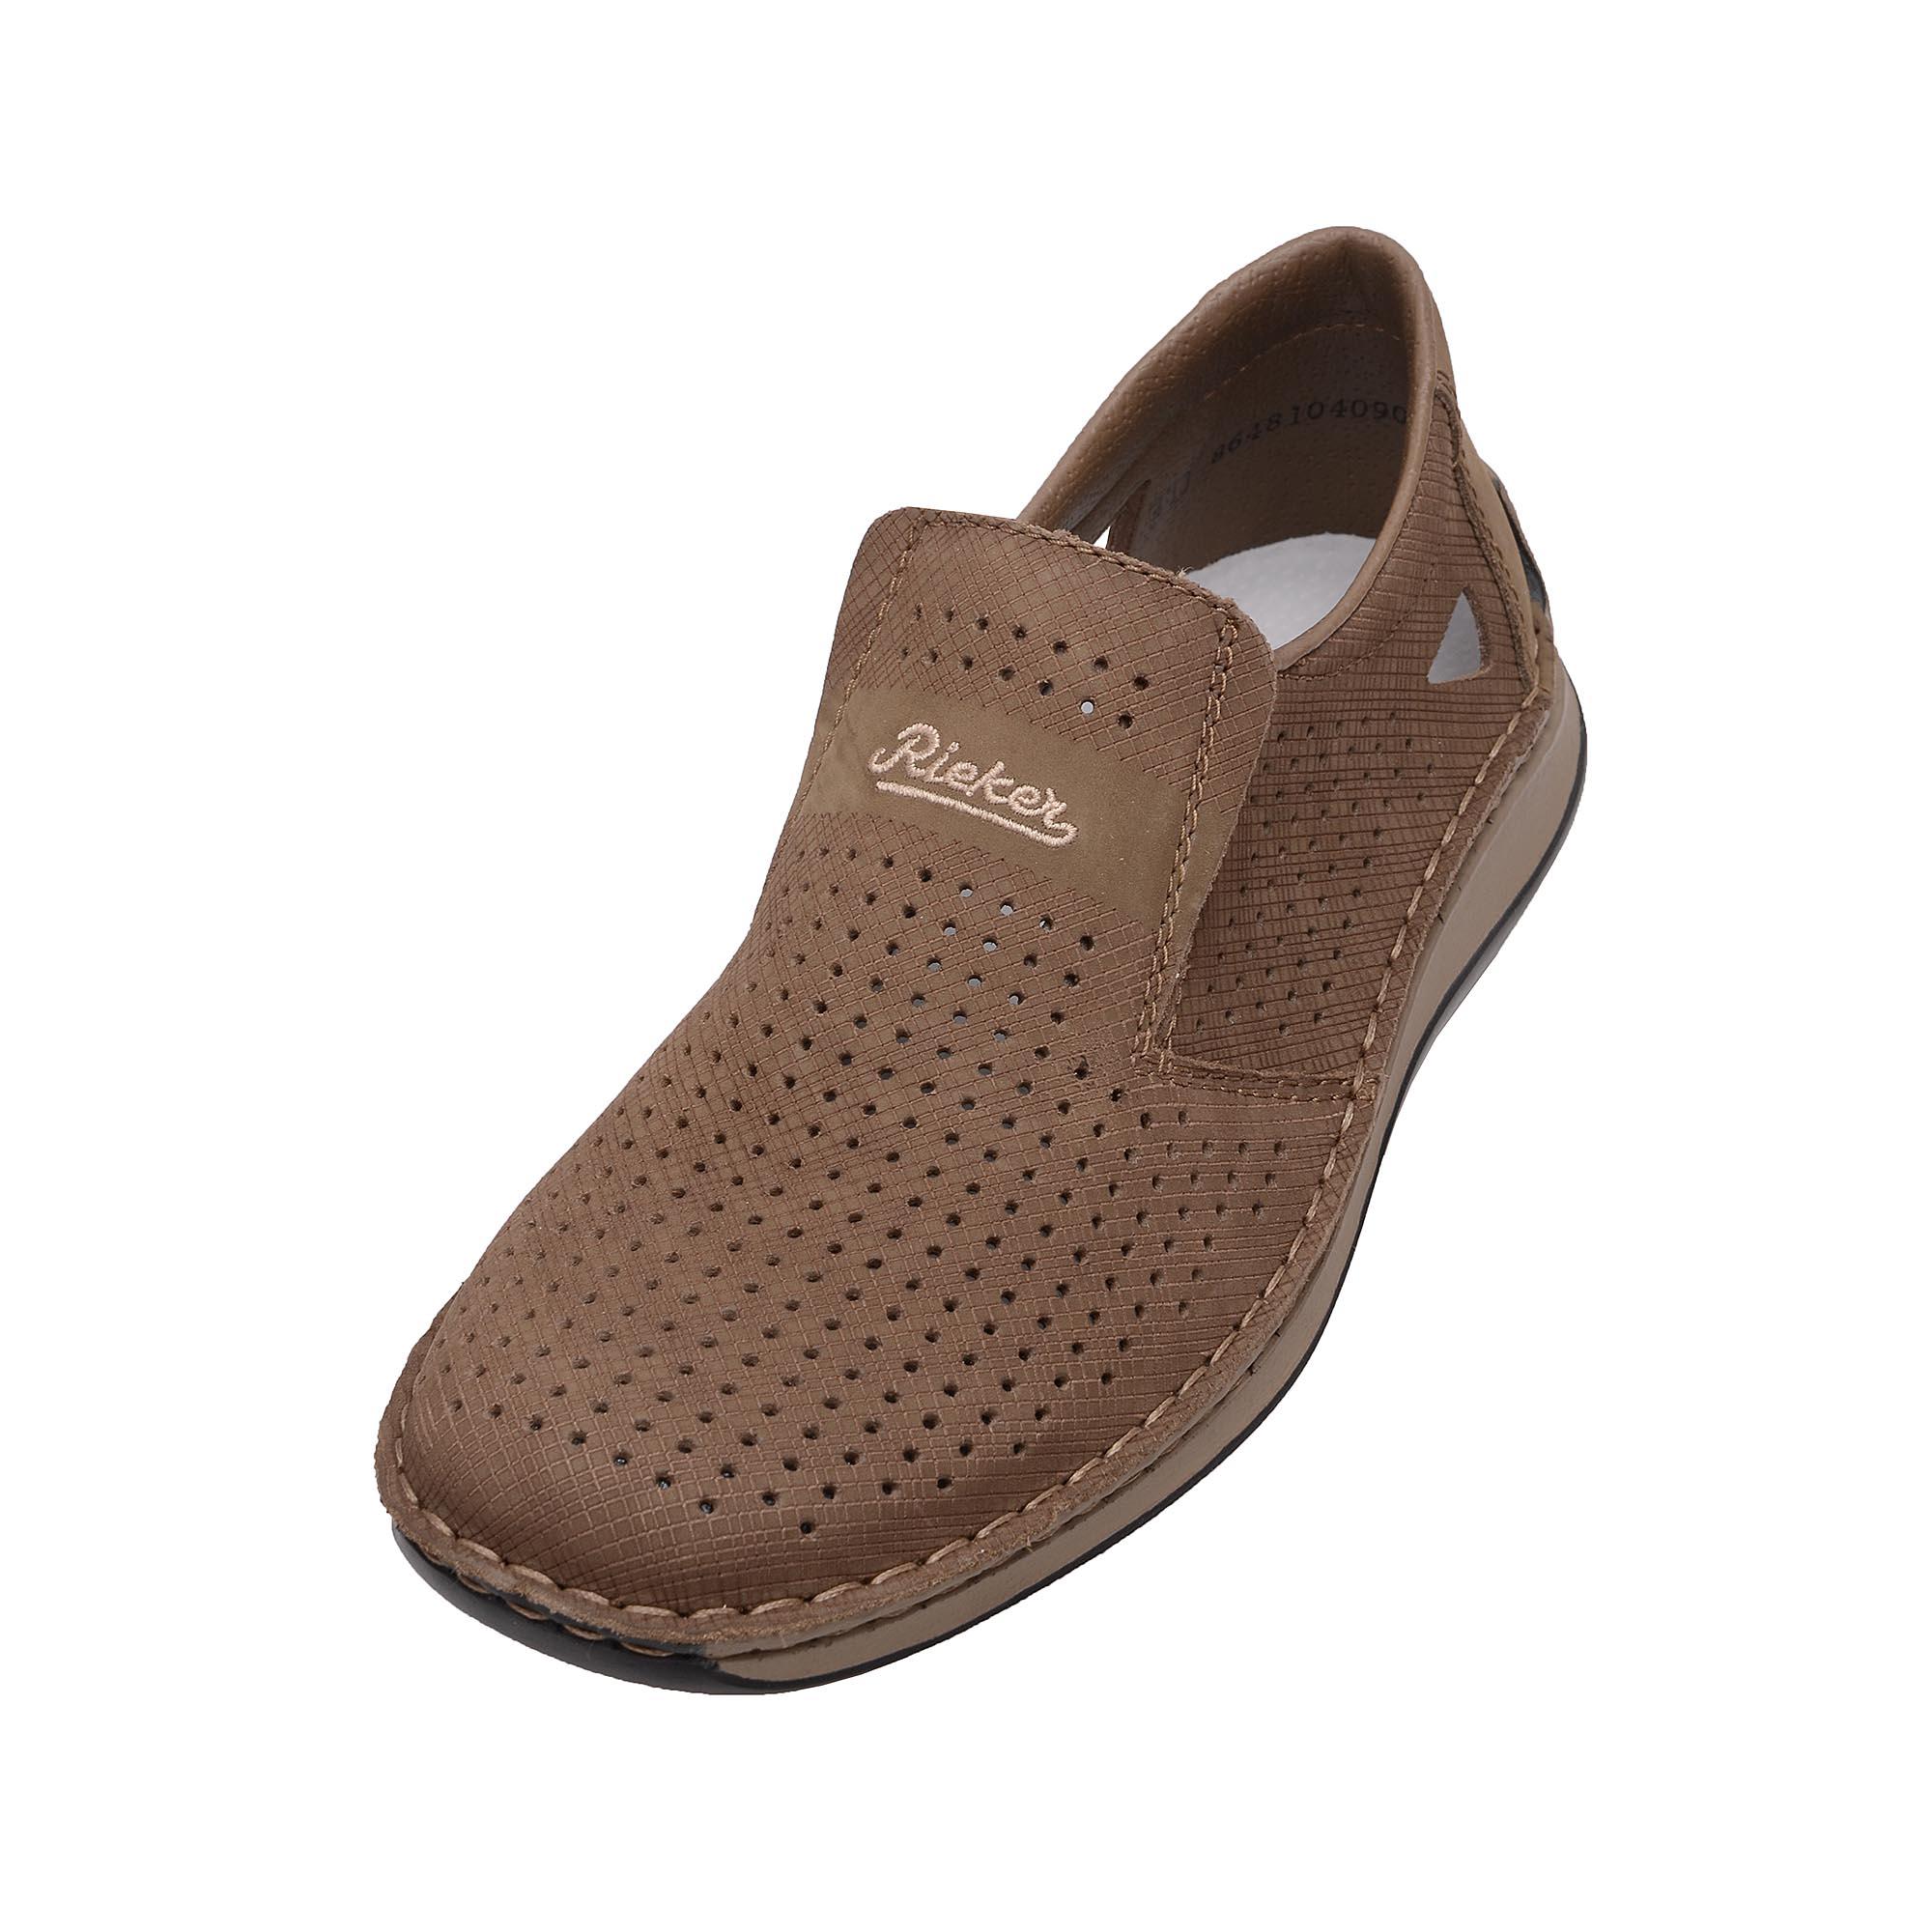 d1e479d477ab detail Pánská obuv RIEKER 05289 64 BEIGE F S 7